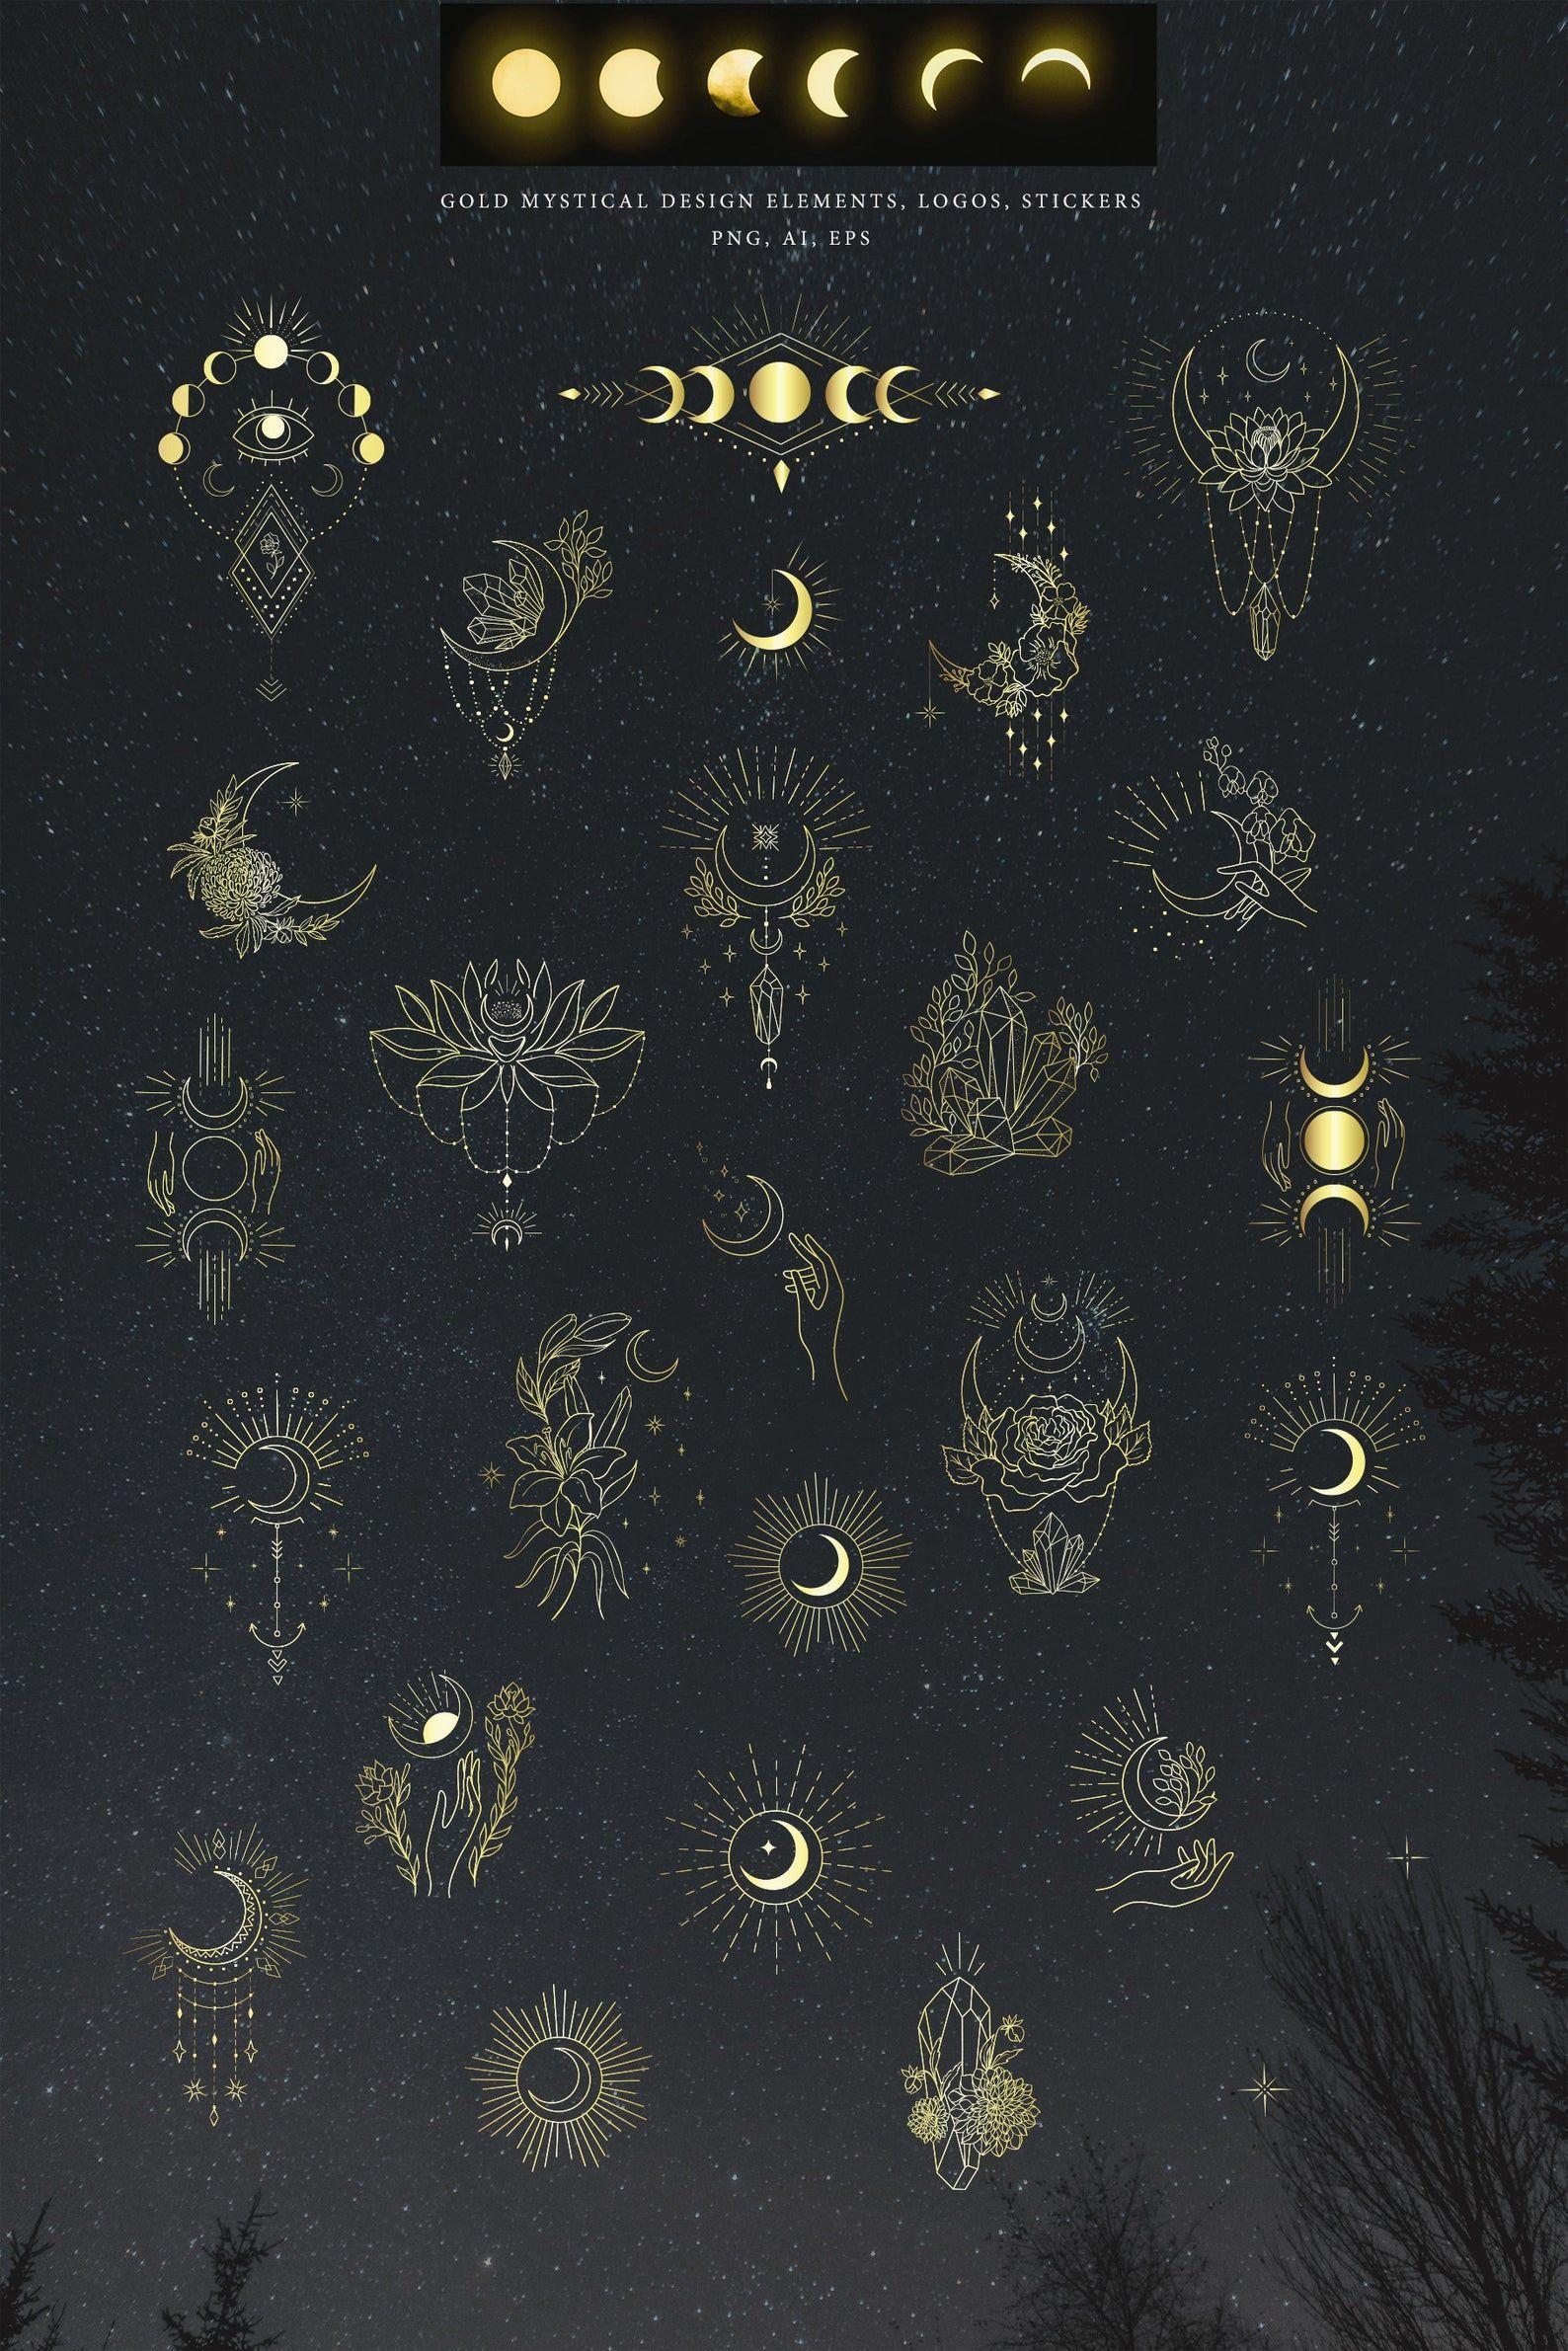 Moon Clipart Crystal Hand Drawn Botanical Floral Leaves Lunar Flower Magic Plant Spiritual Branch Tattoo Logo Astrology Yoga Cosmic Gold SVG